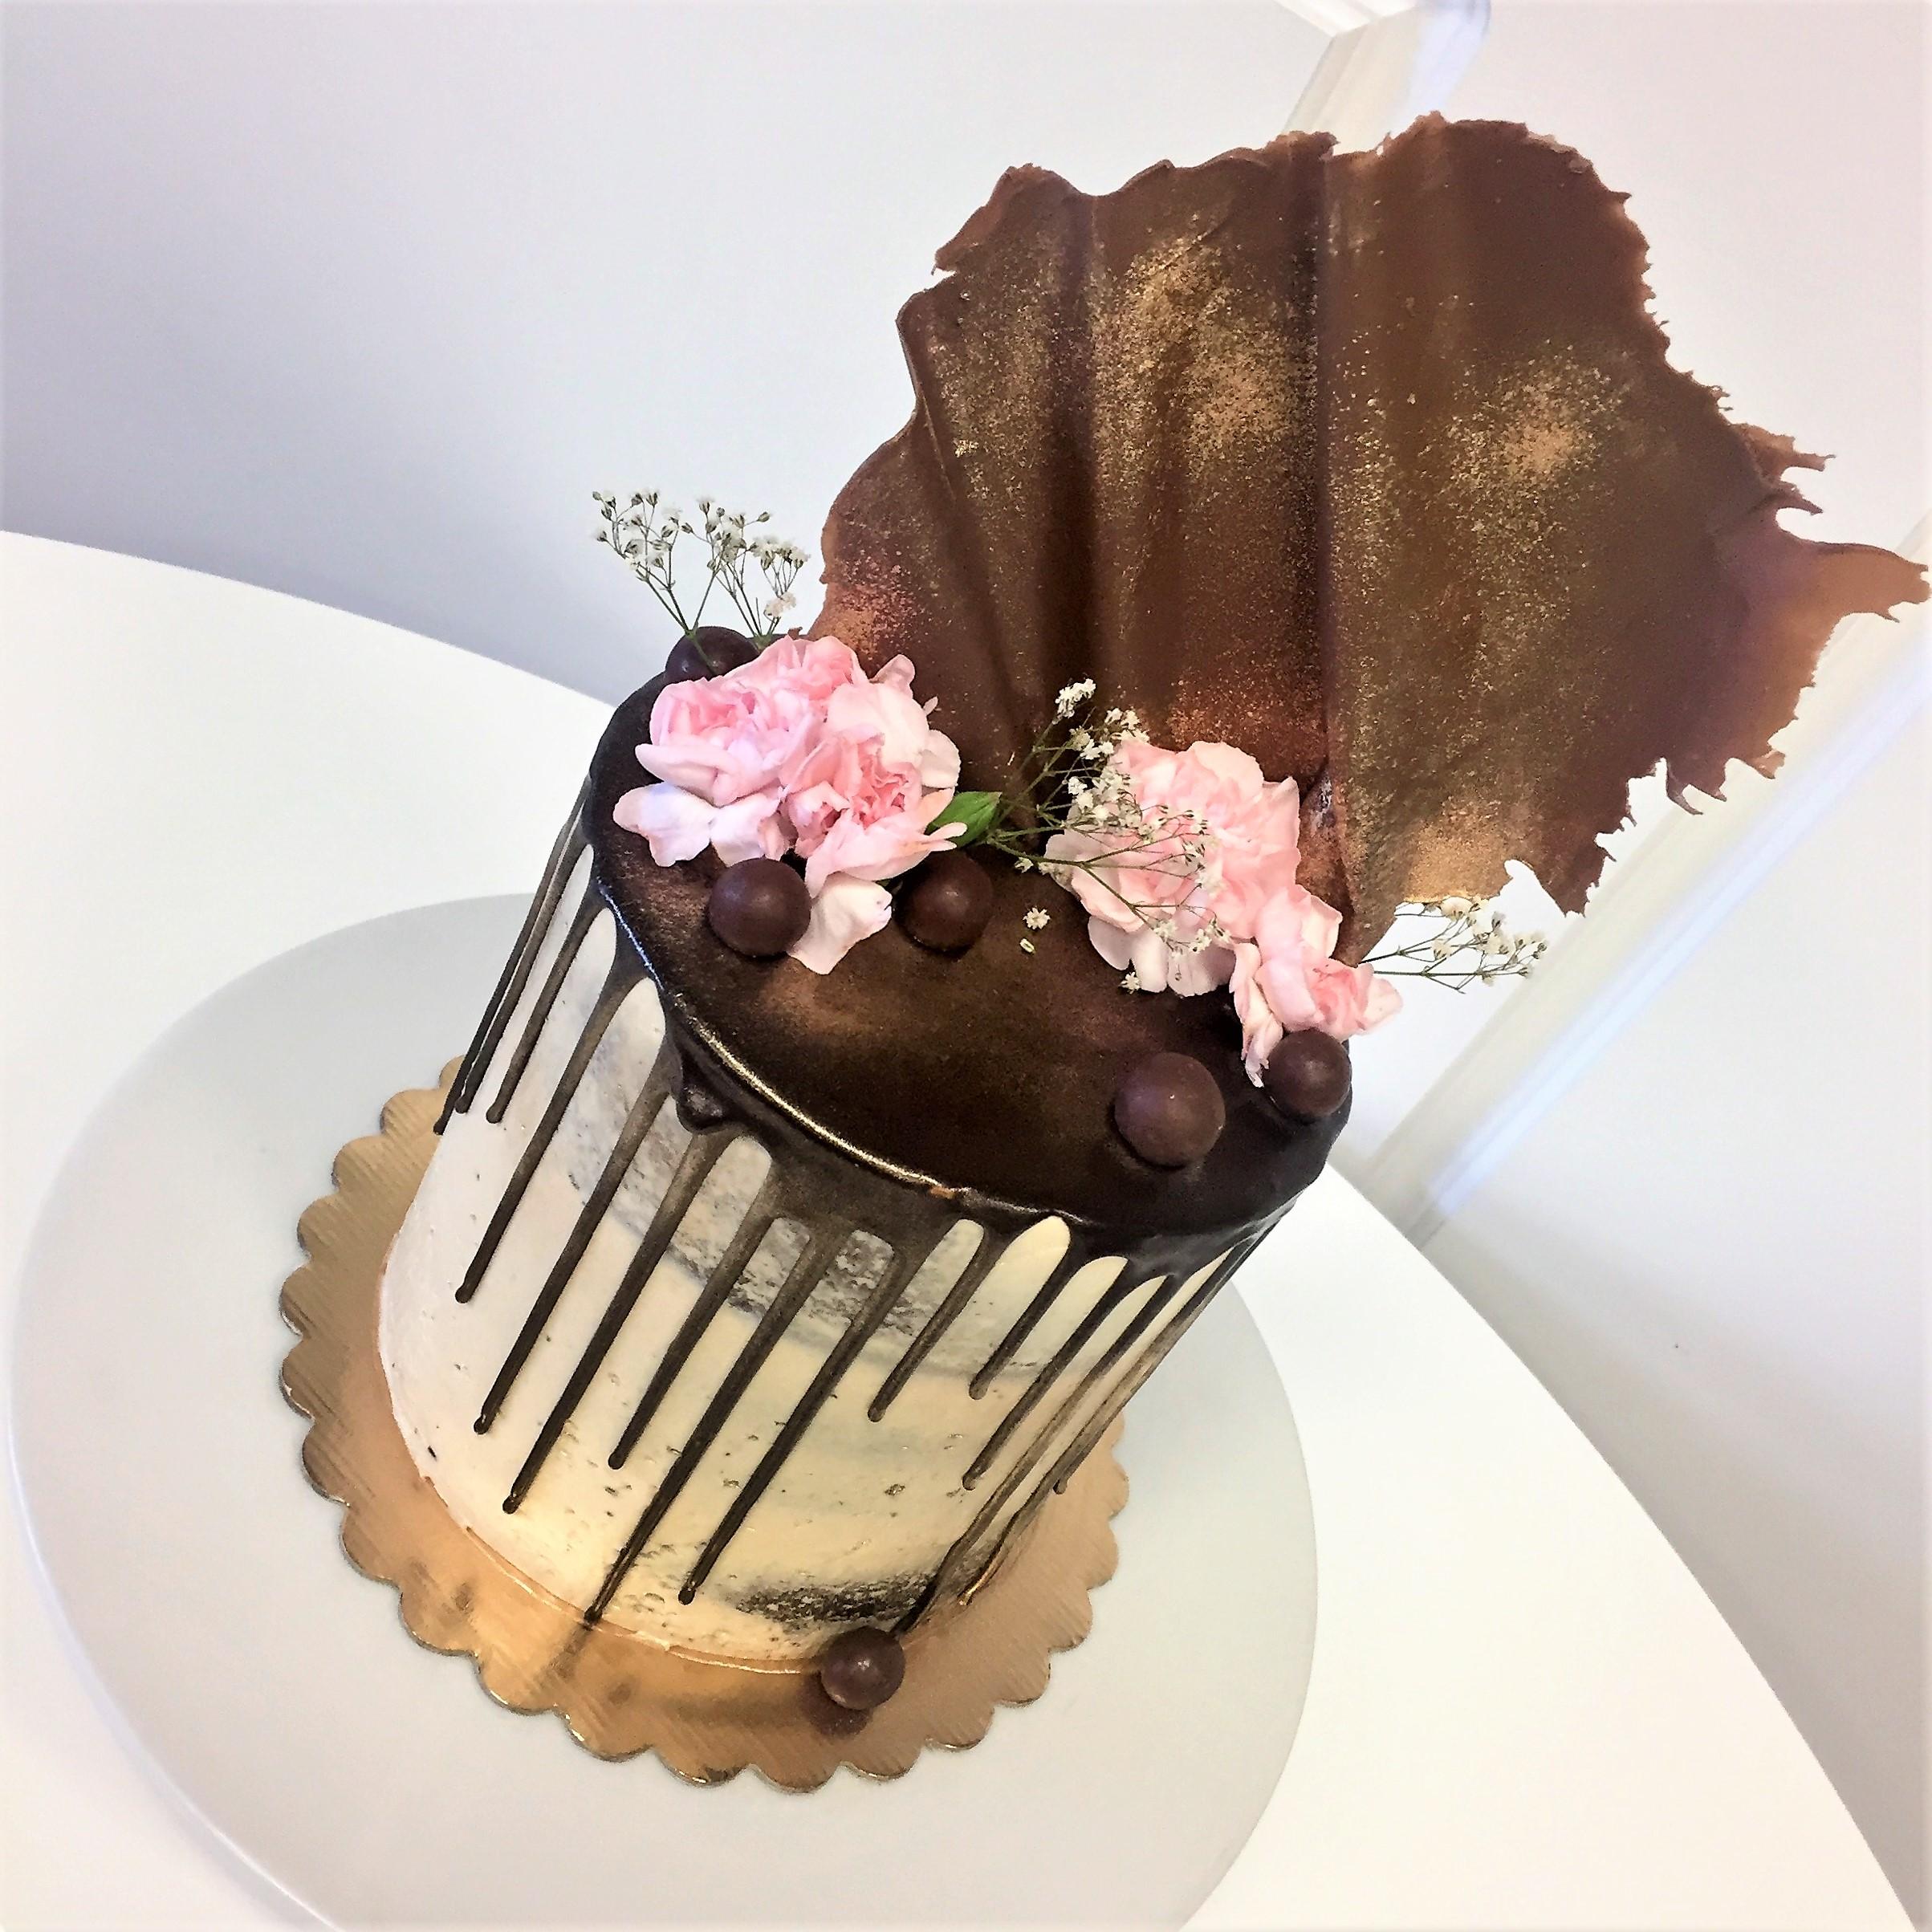 6'' chocolate caramel cake